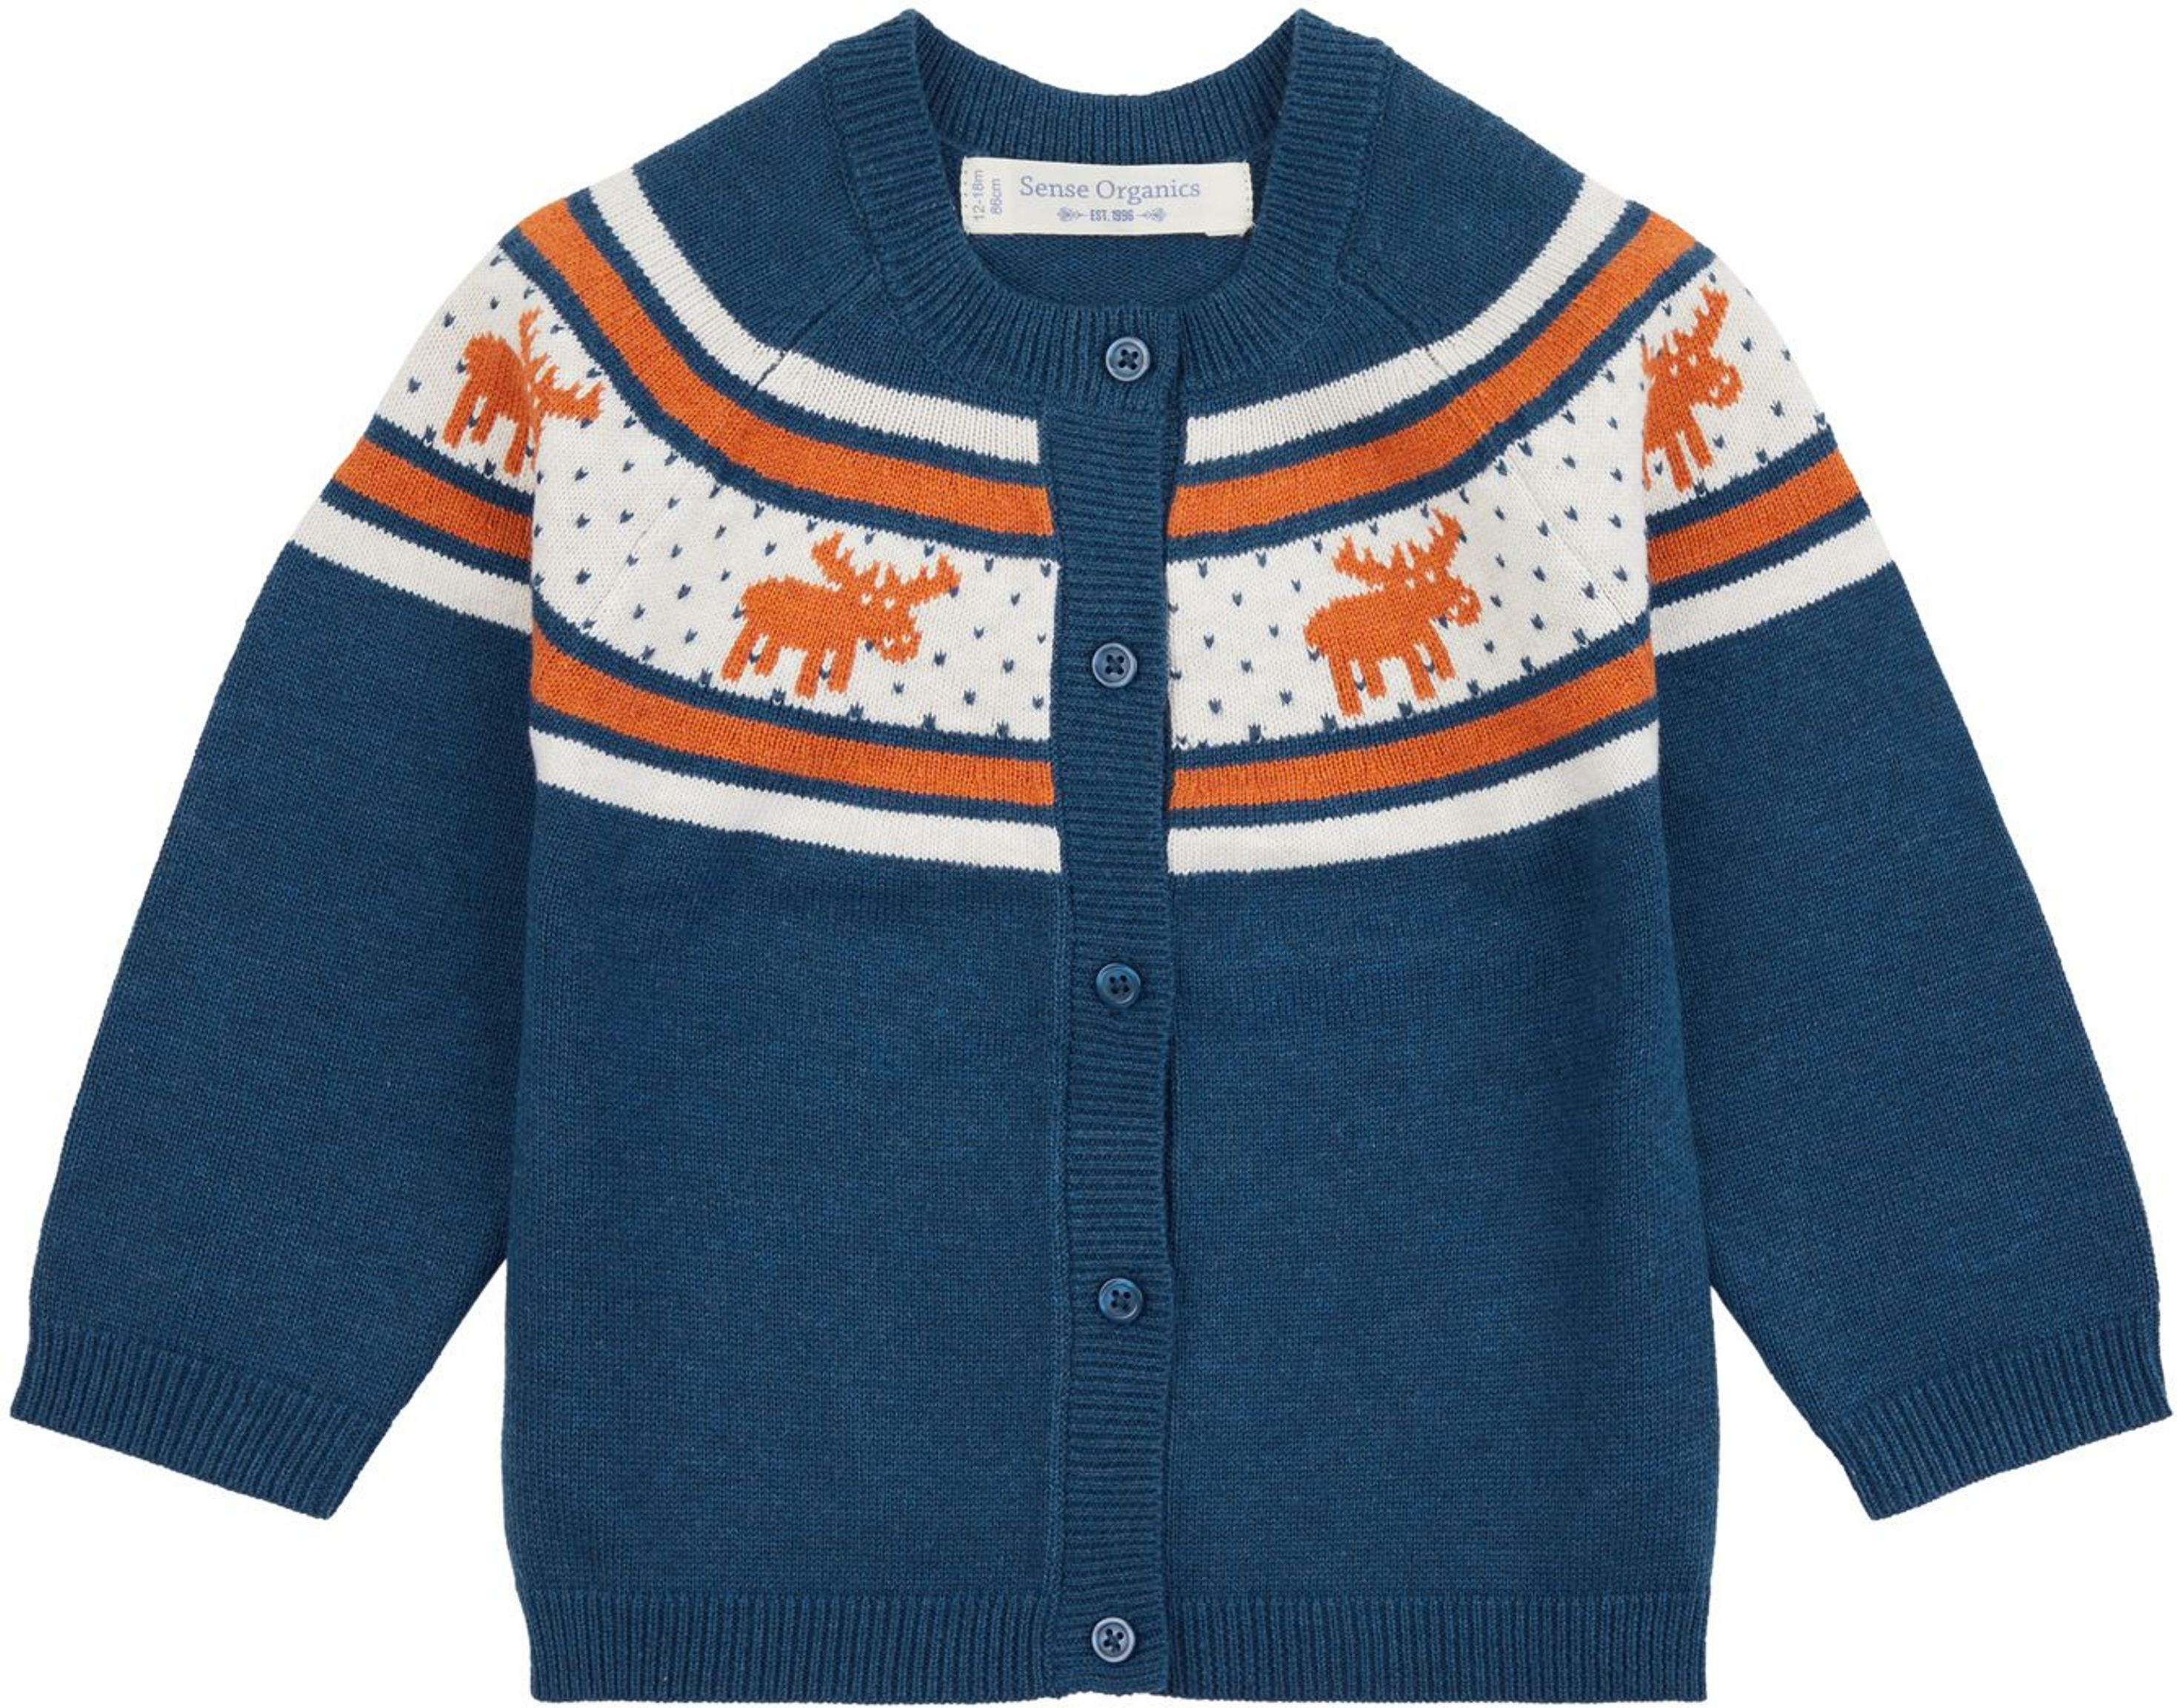 Sense Organic MAXIM Baby Knitted Cardigan blue